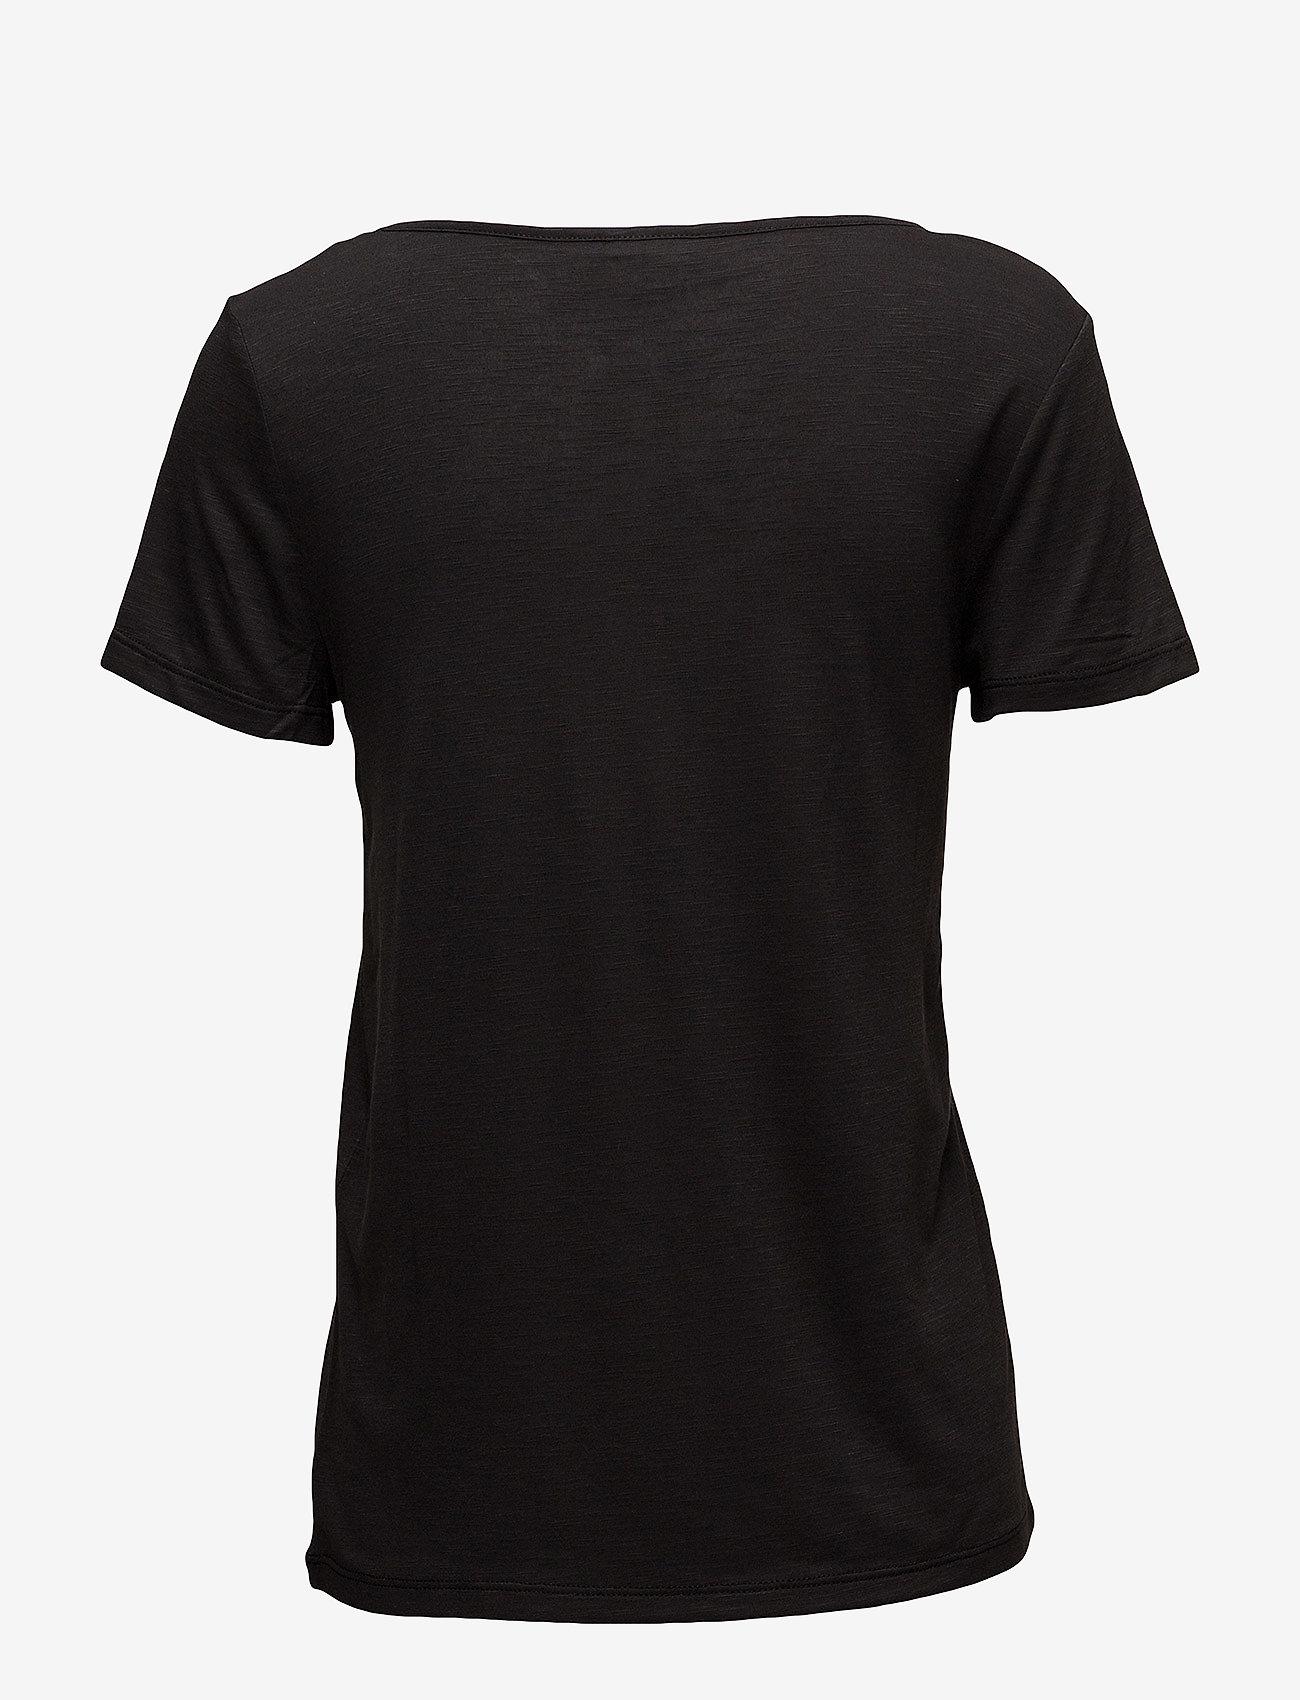 Vila - VINOEL S/S V-NECK T-SHIRT-NOOS - t-shirts - black - 1